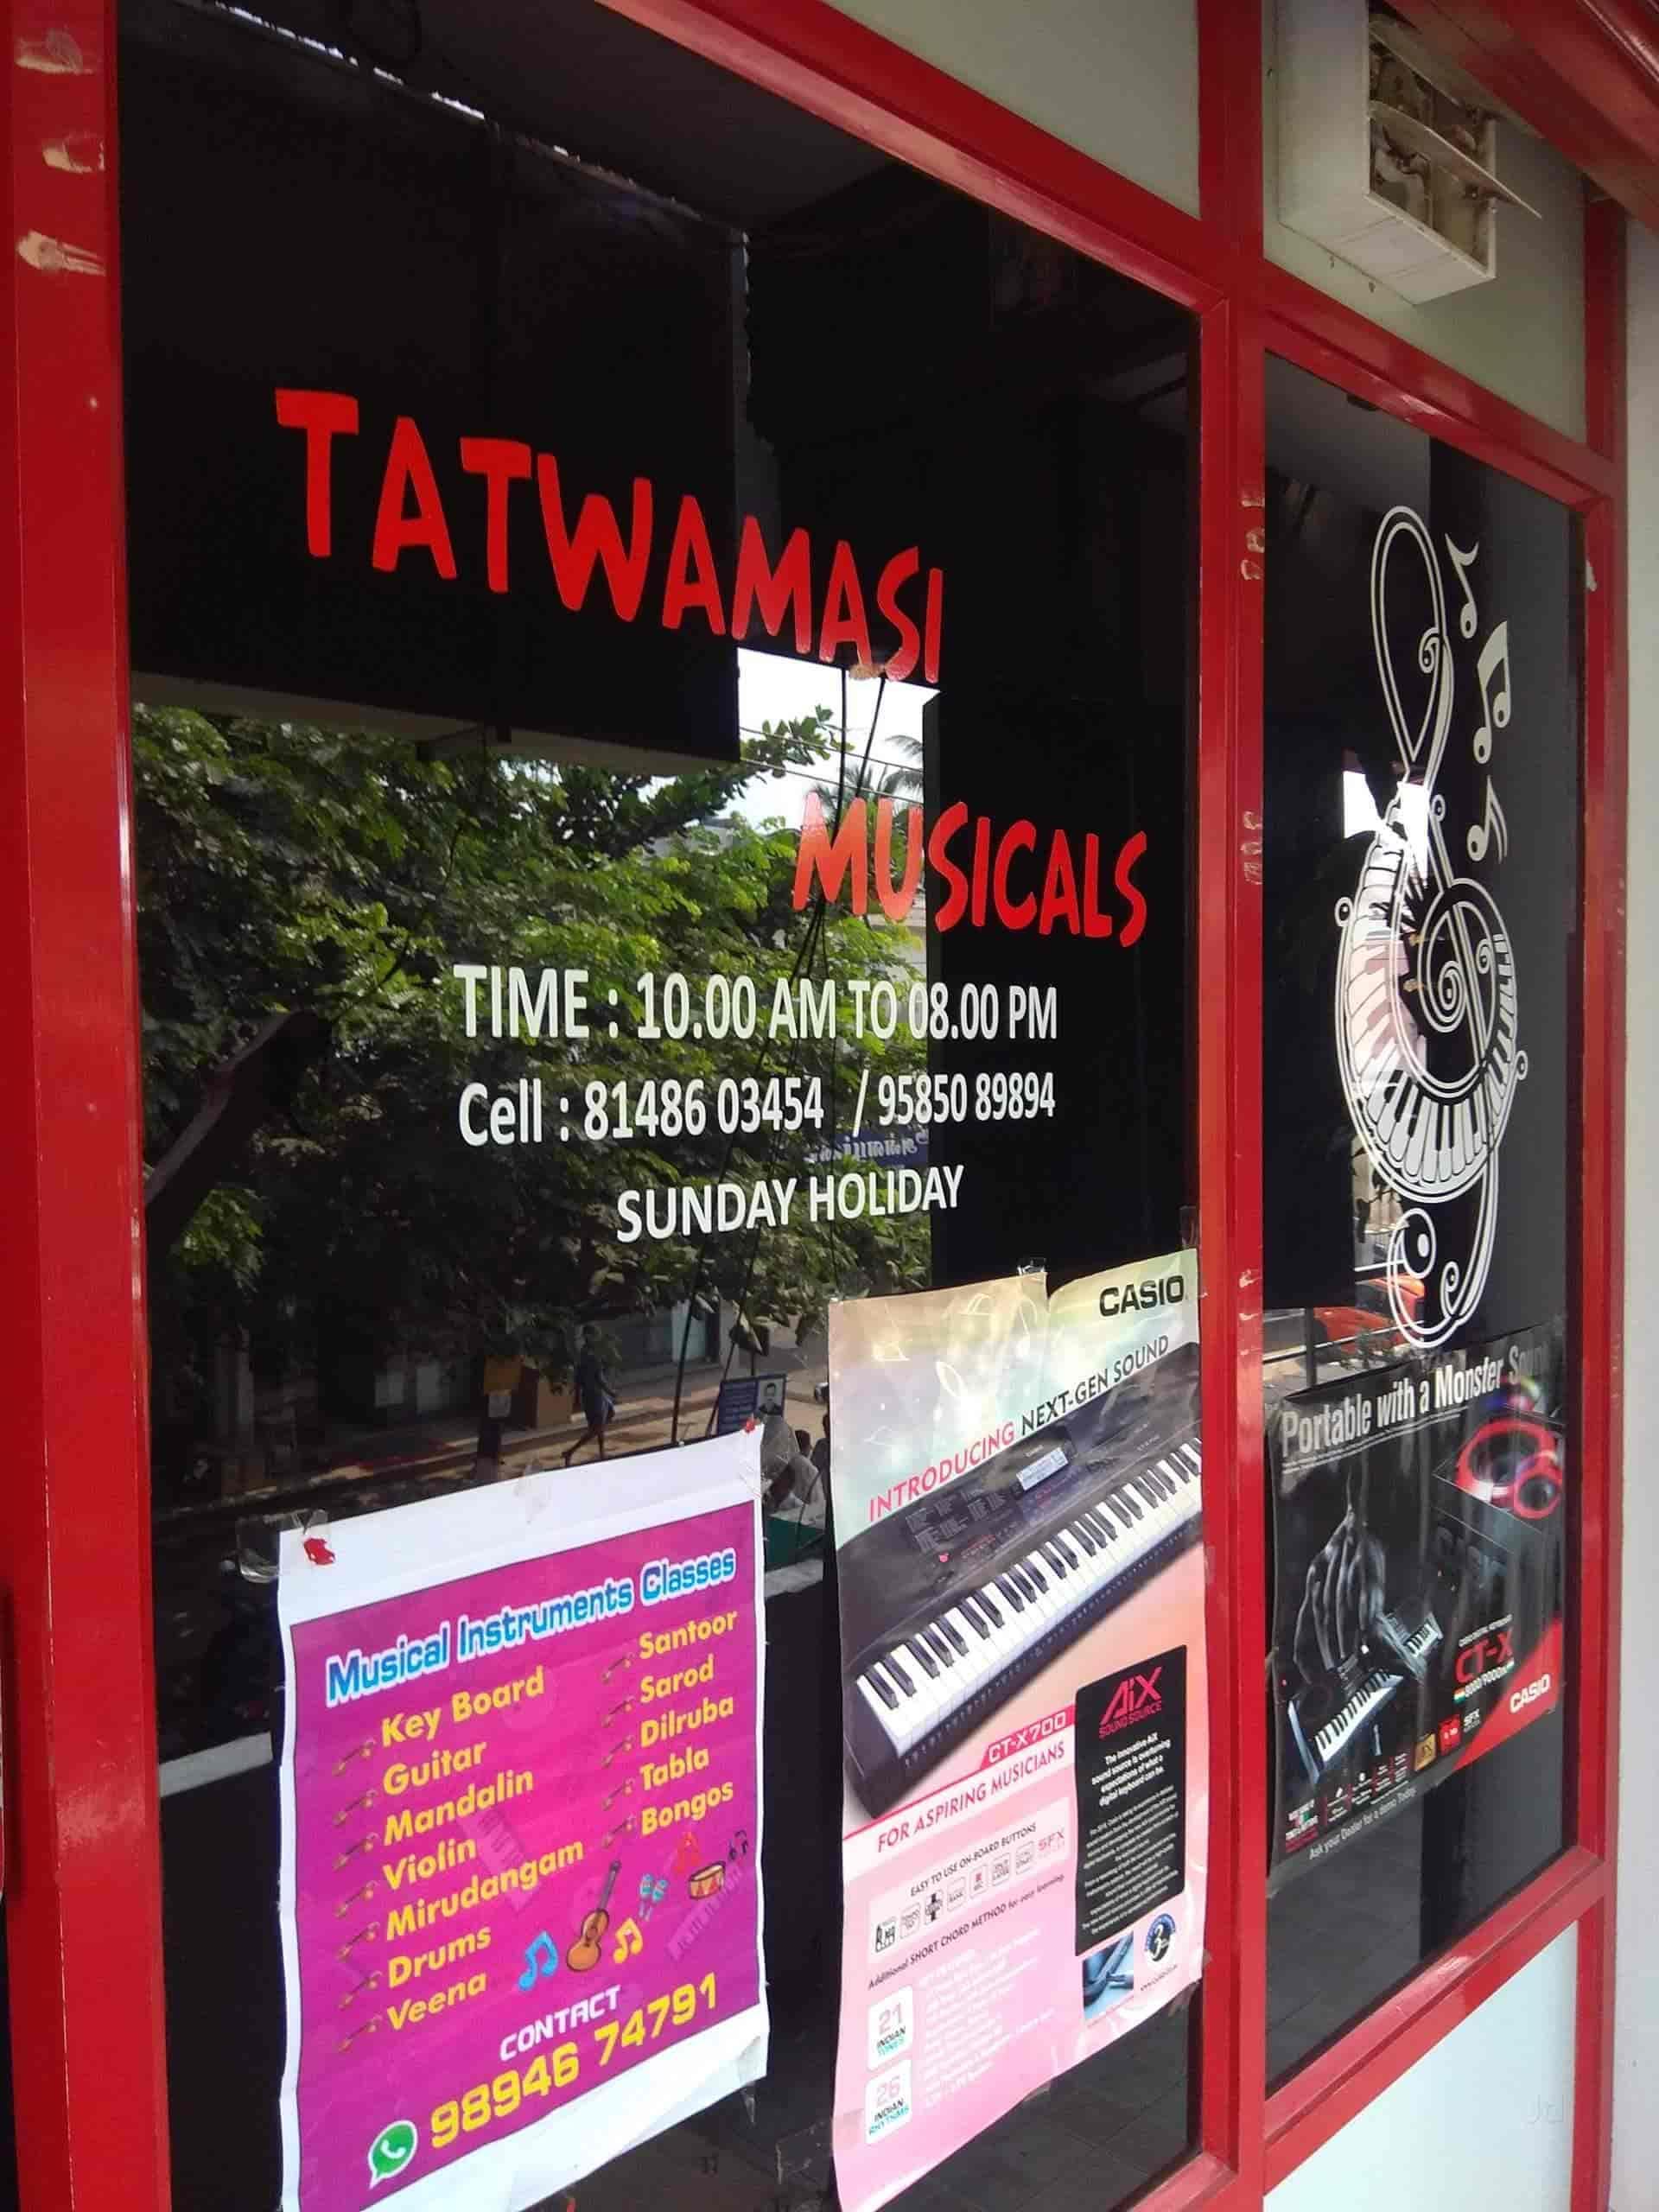 Tatwamasi Musicals, Saibaba Colony - Musical Instrument